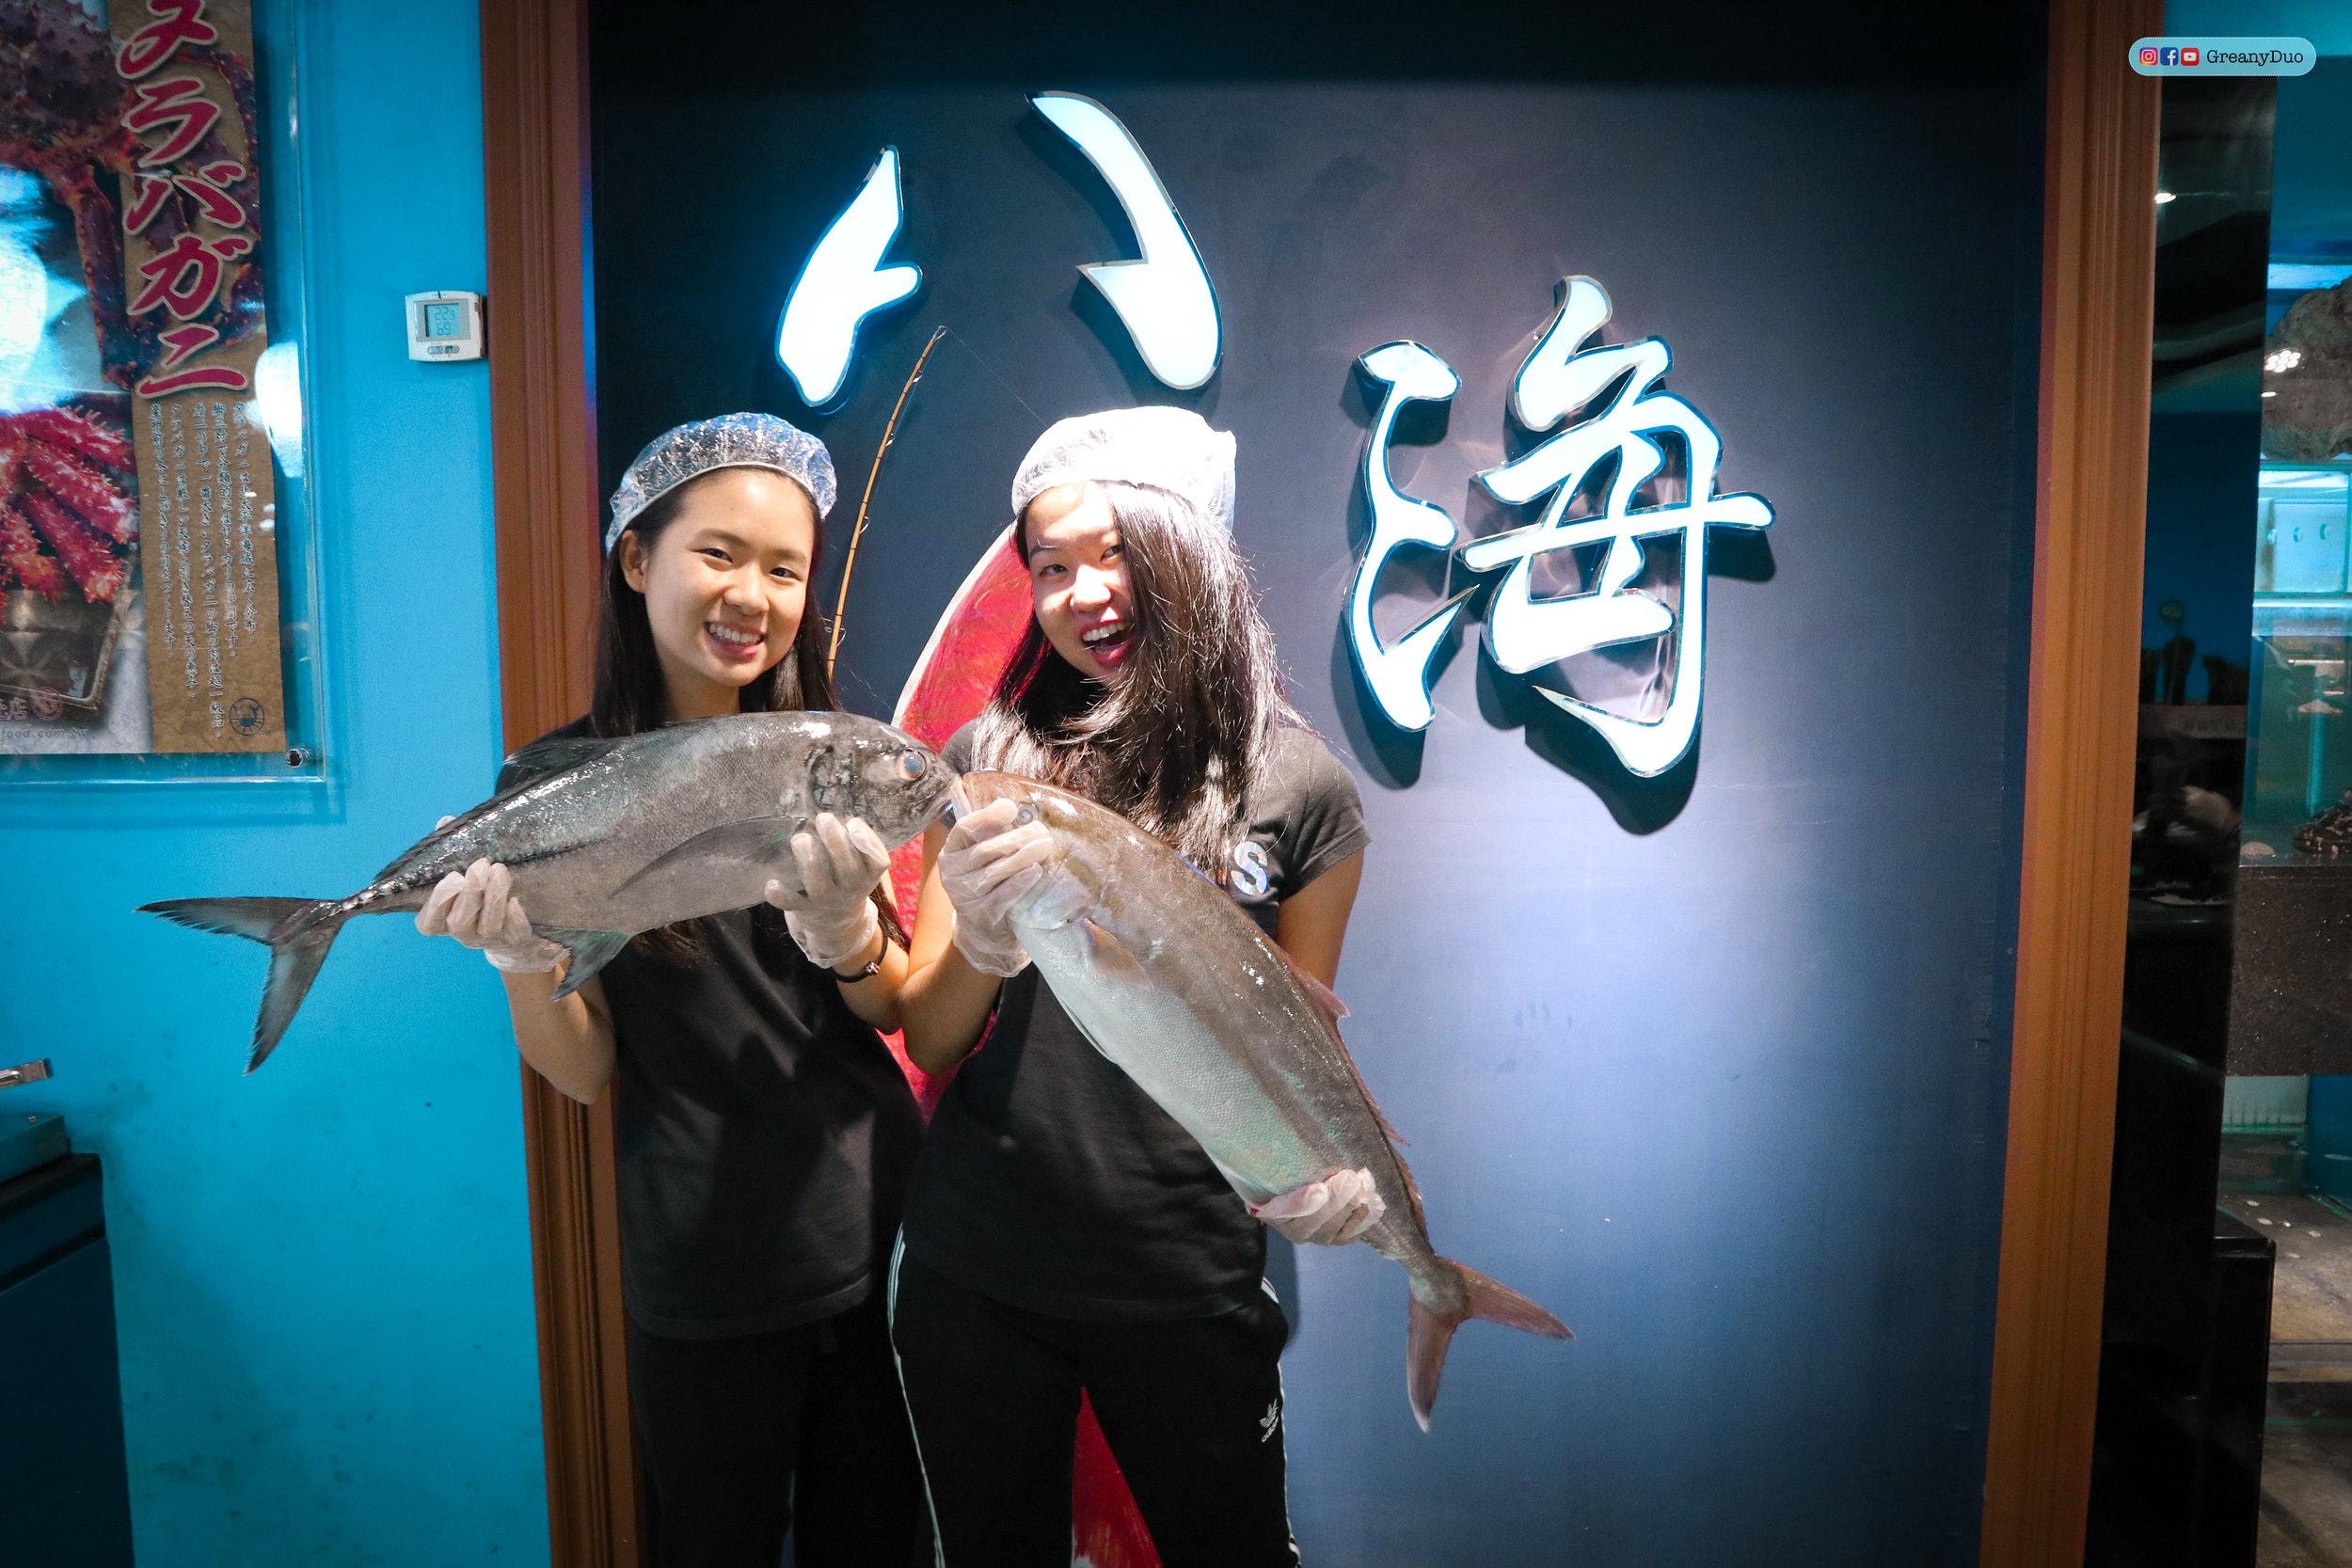 jenny and tina holding fresh fishes at บุฟเฟ่ต์ชาบูไต้หวันที่ Hakkai Shabu Shabu ซีเหมินติง